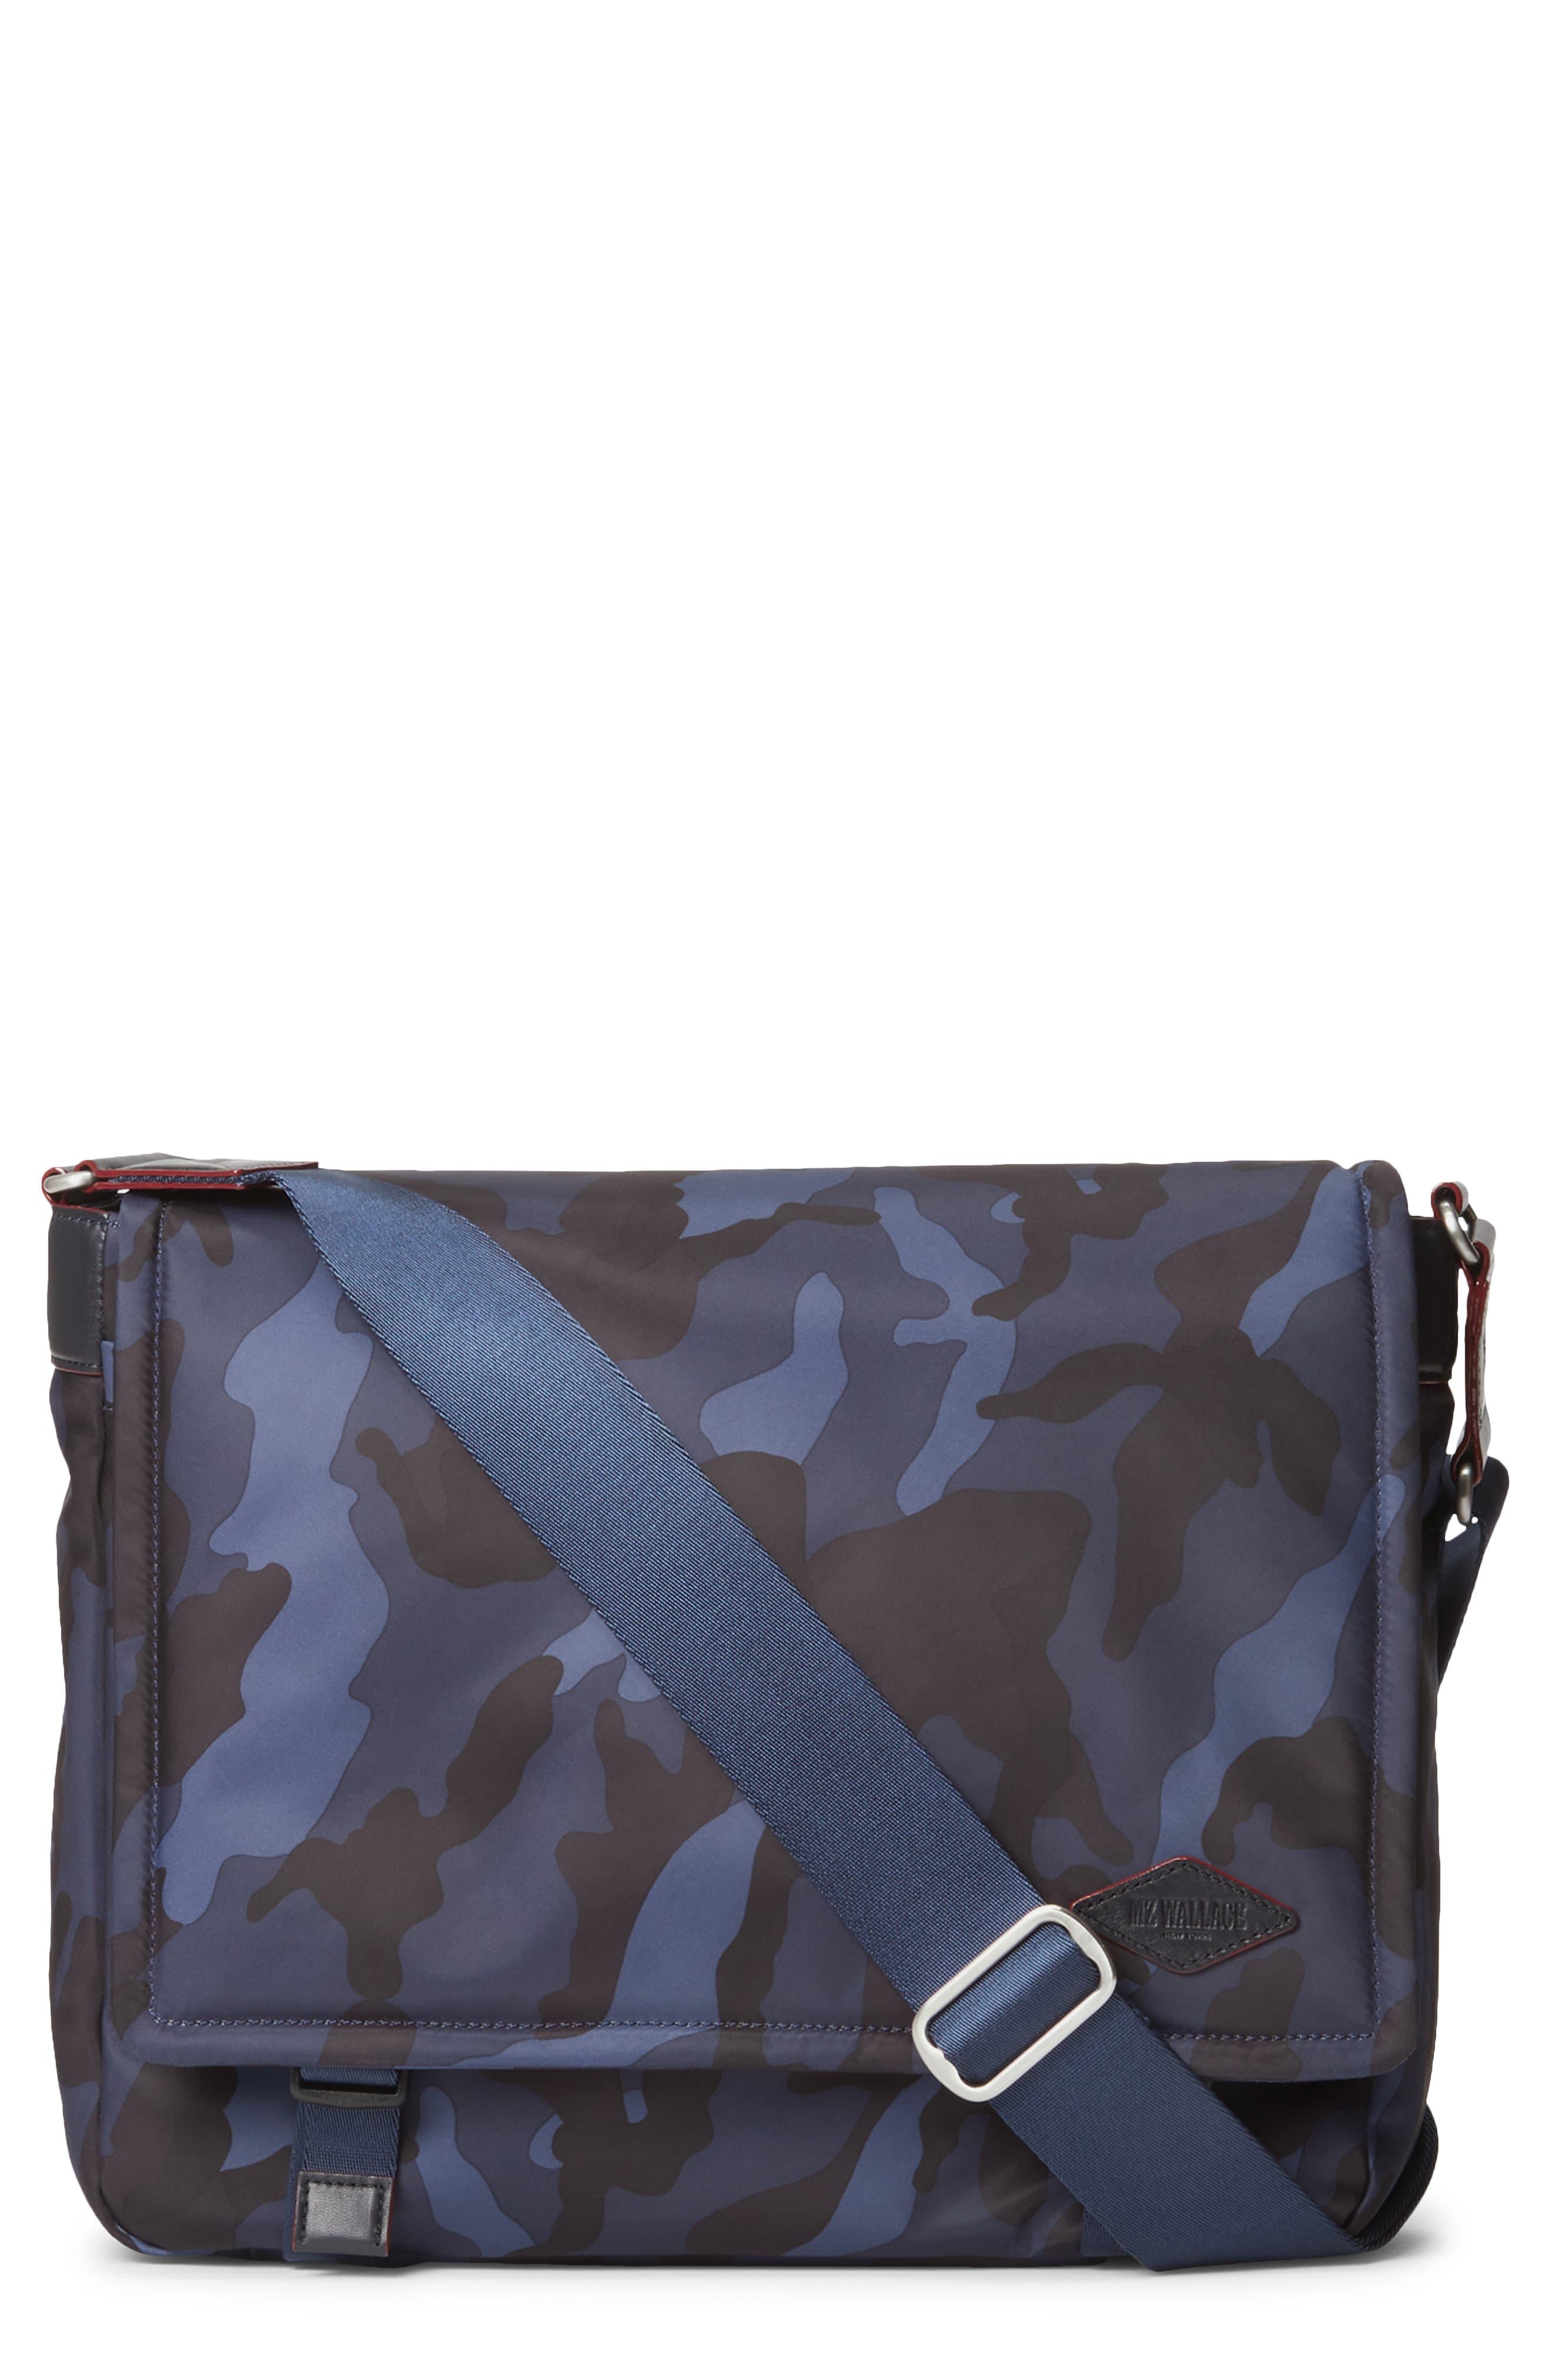 Mz Wallace Bleecker Nylon Messenger Bag - Blue